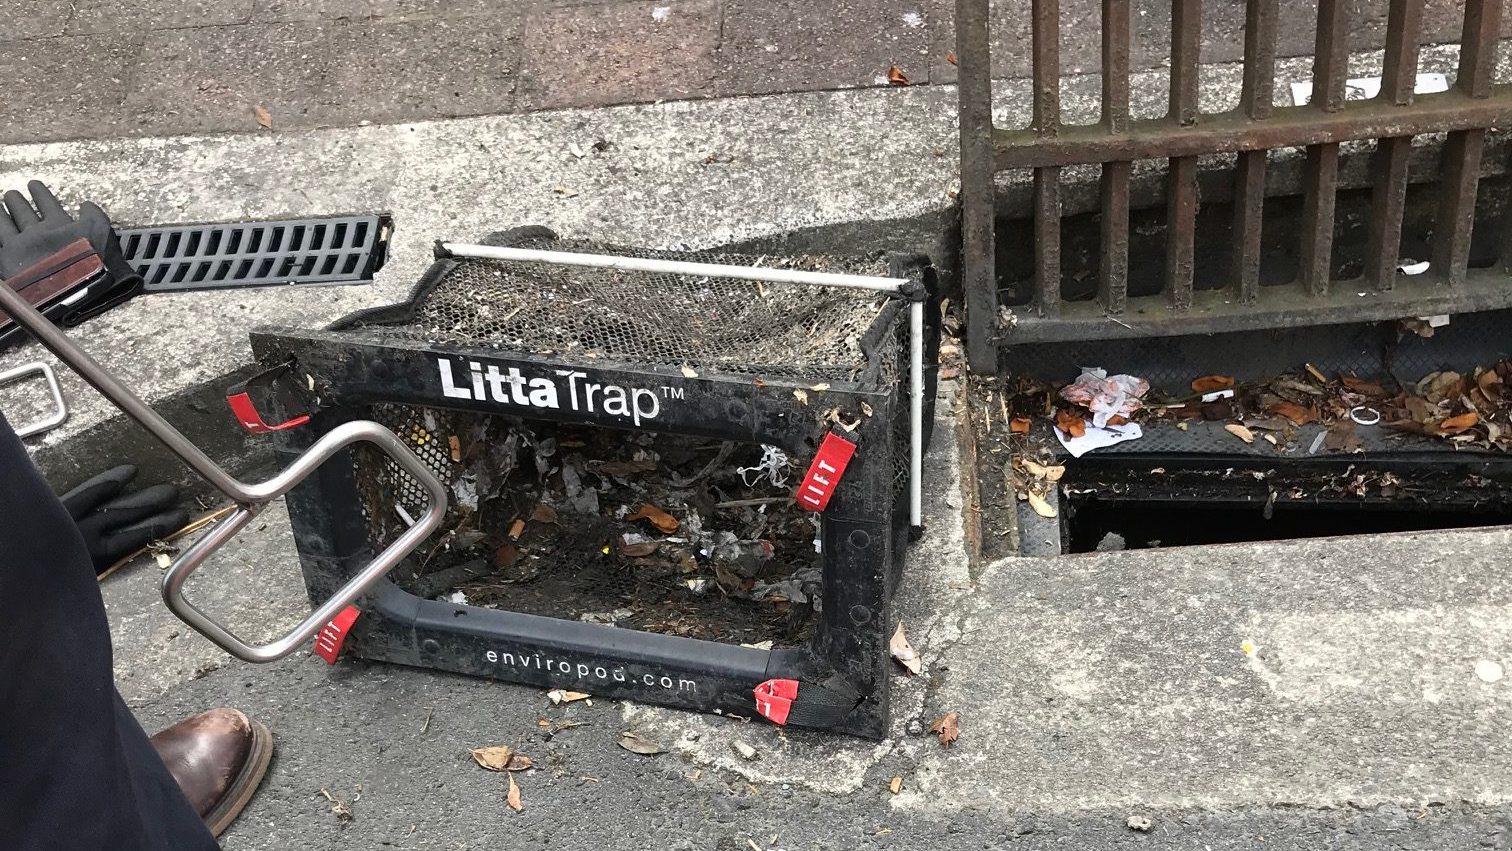 Litta Trap